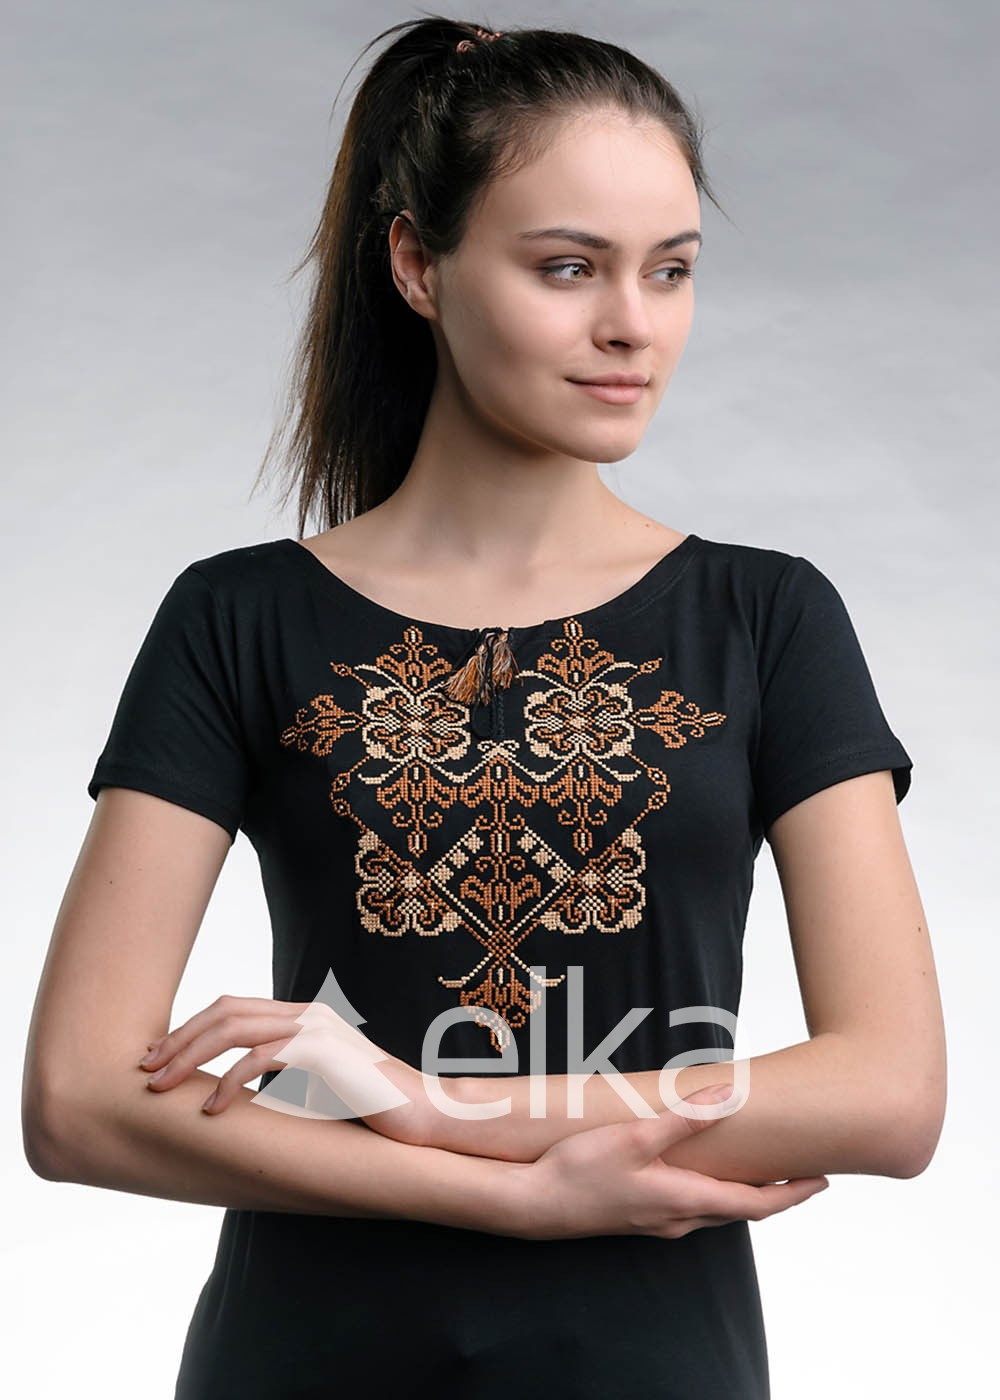 Вышитая футболка Харьковская